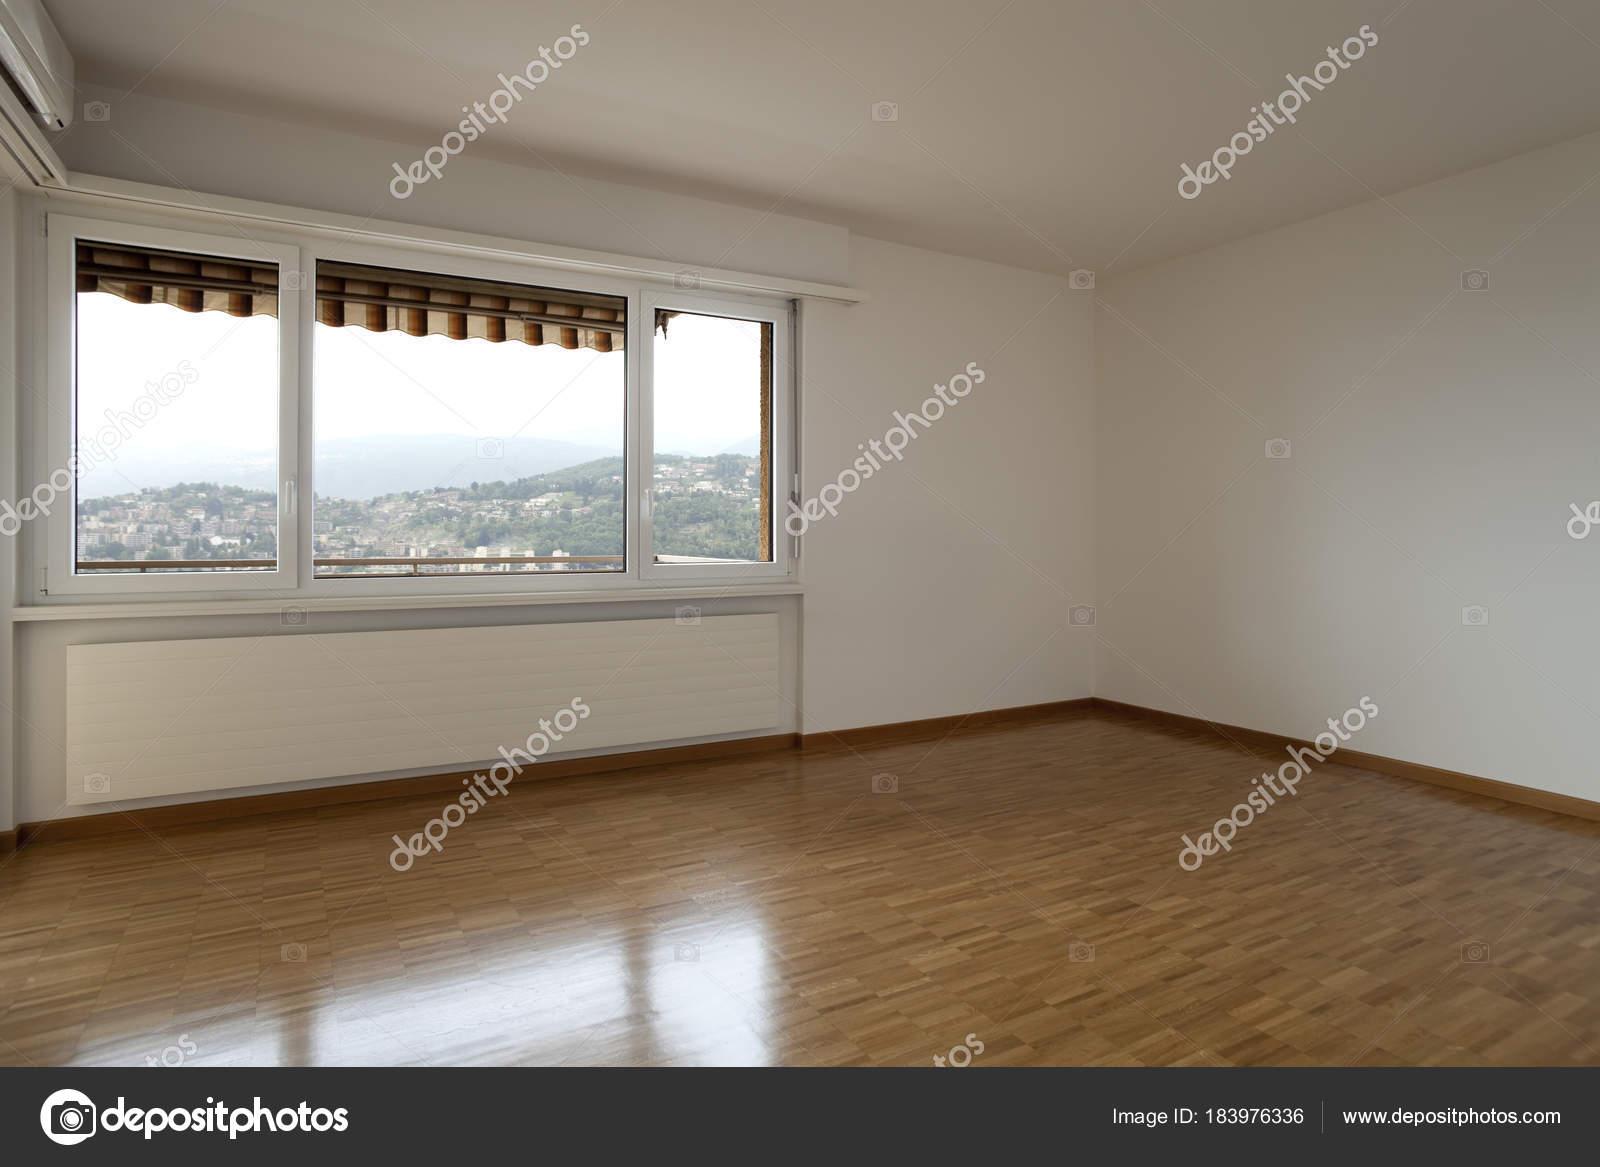 Vide Chambre Moderne Avec Windows Photographie Zveiger C 183976336